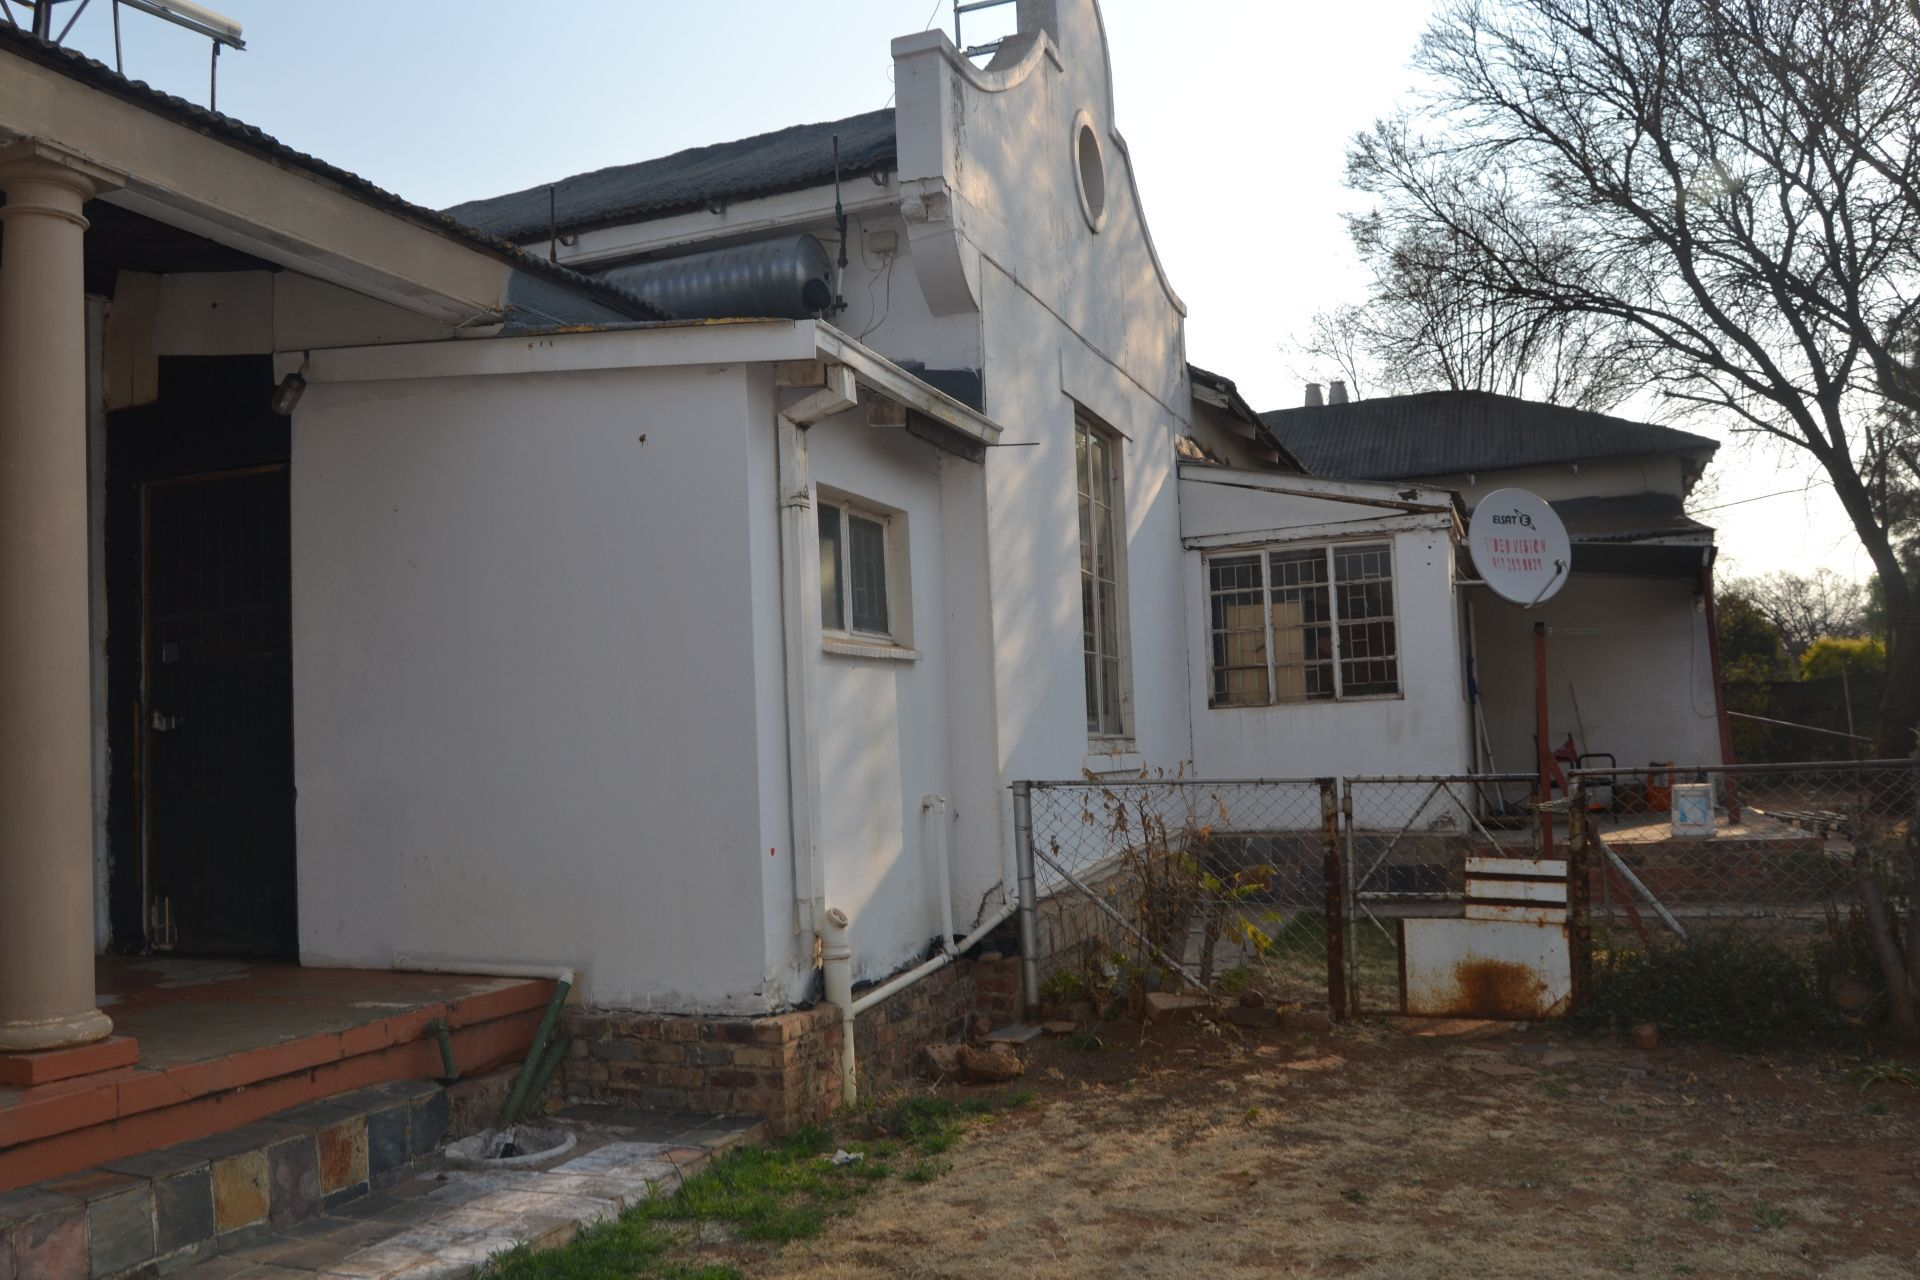 Heilige Akker property for sale. Ref No: 13526787. Picture no 3